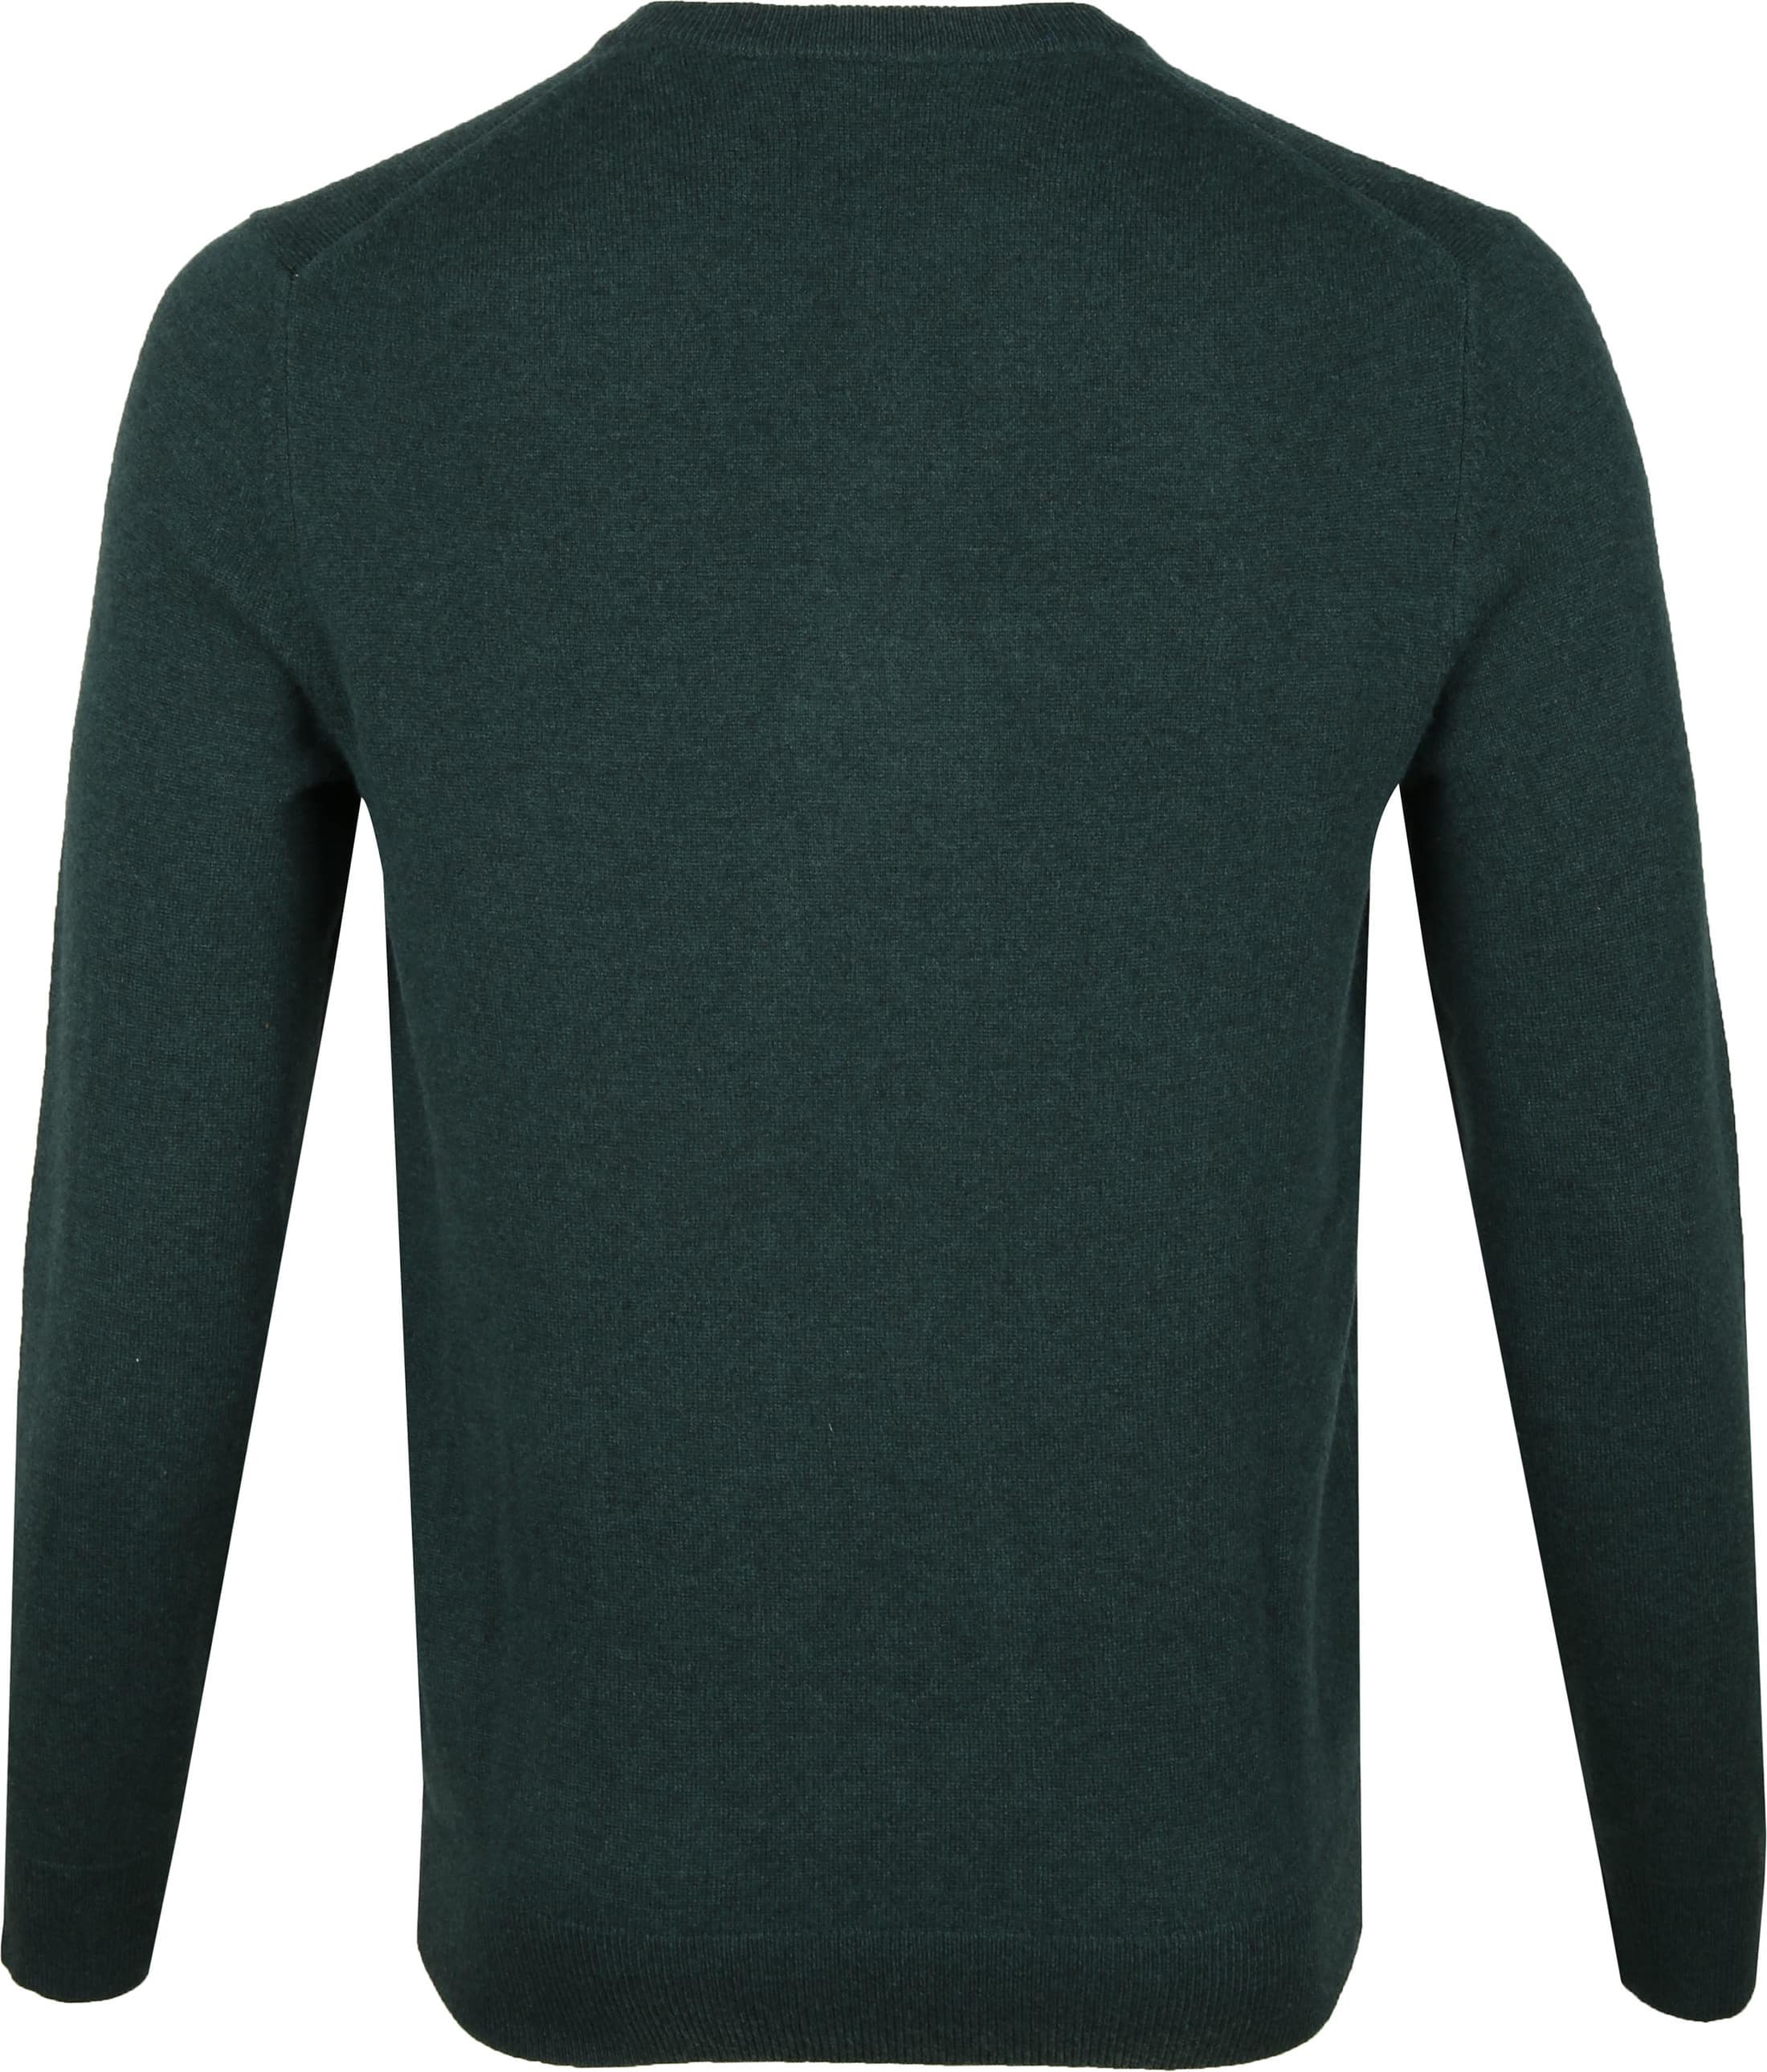 Gant Lambswool Pullover Dark Green photo 3